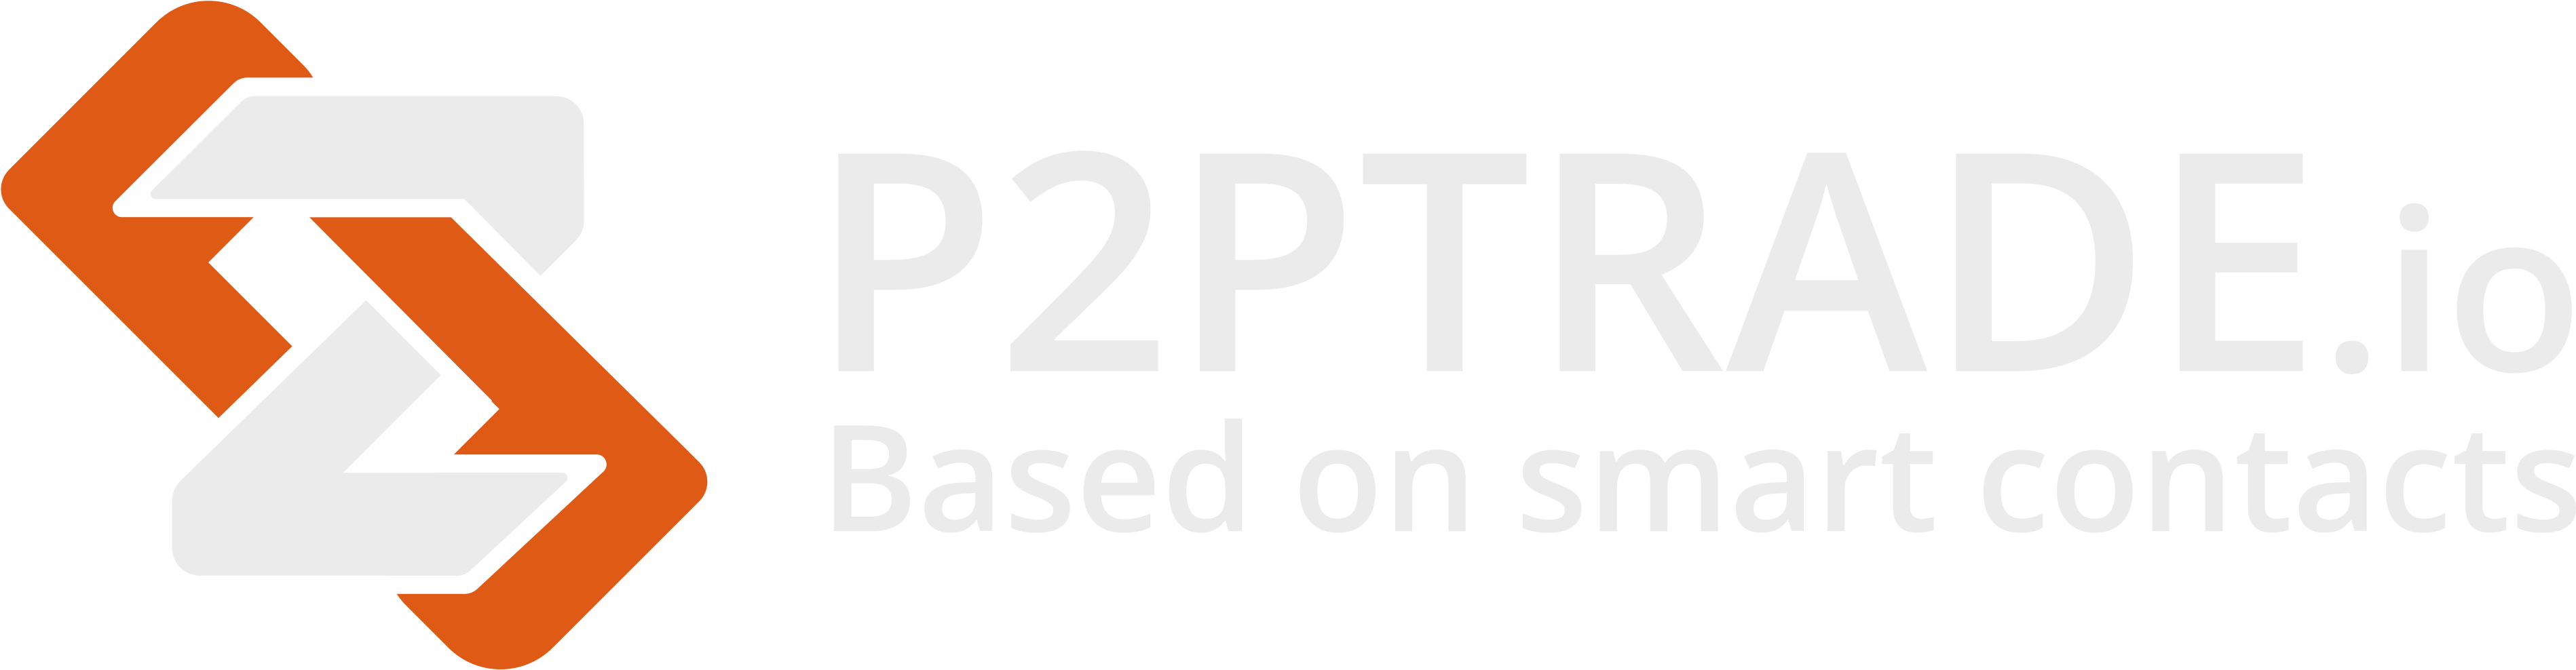 P2PTRADE